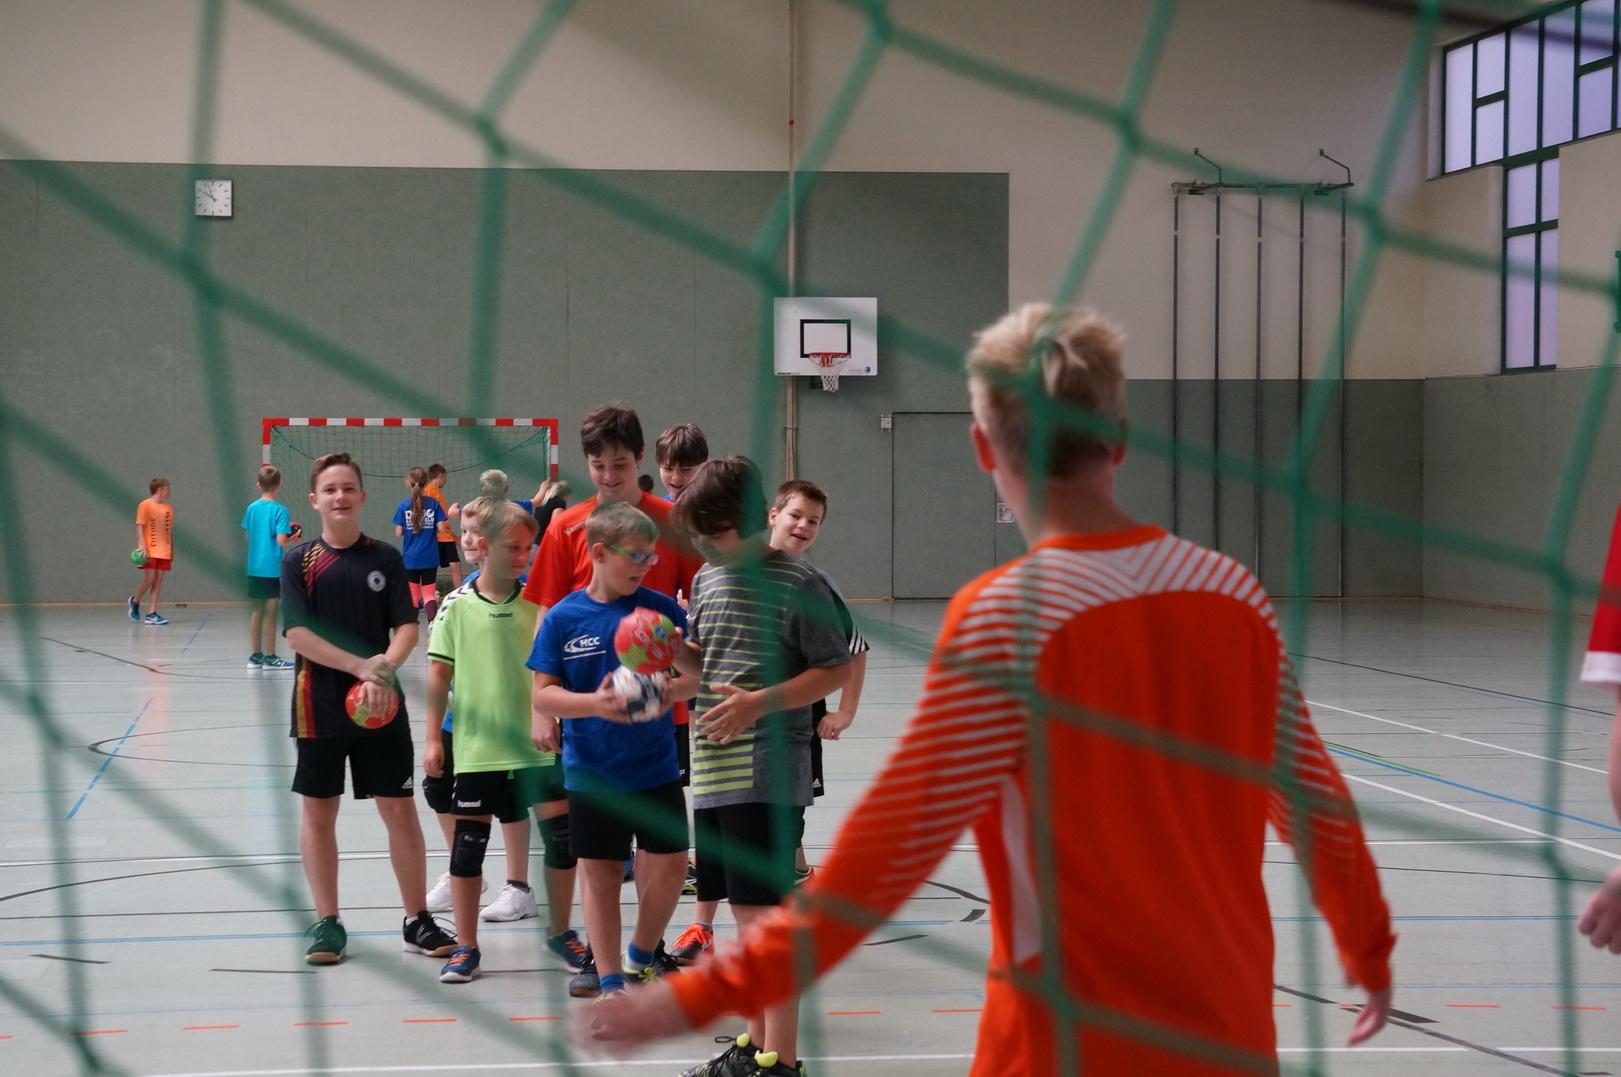 201808_Handballcamp_SDH_MG_134w